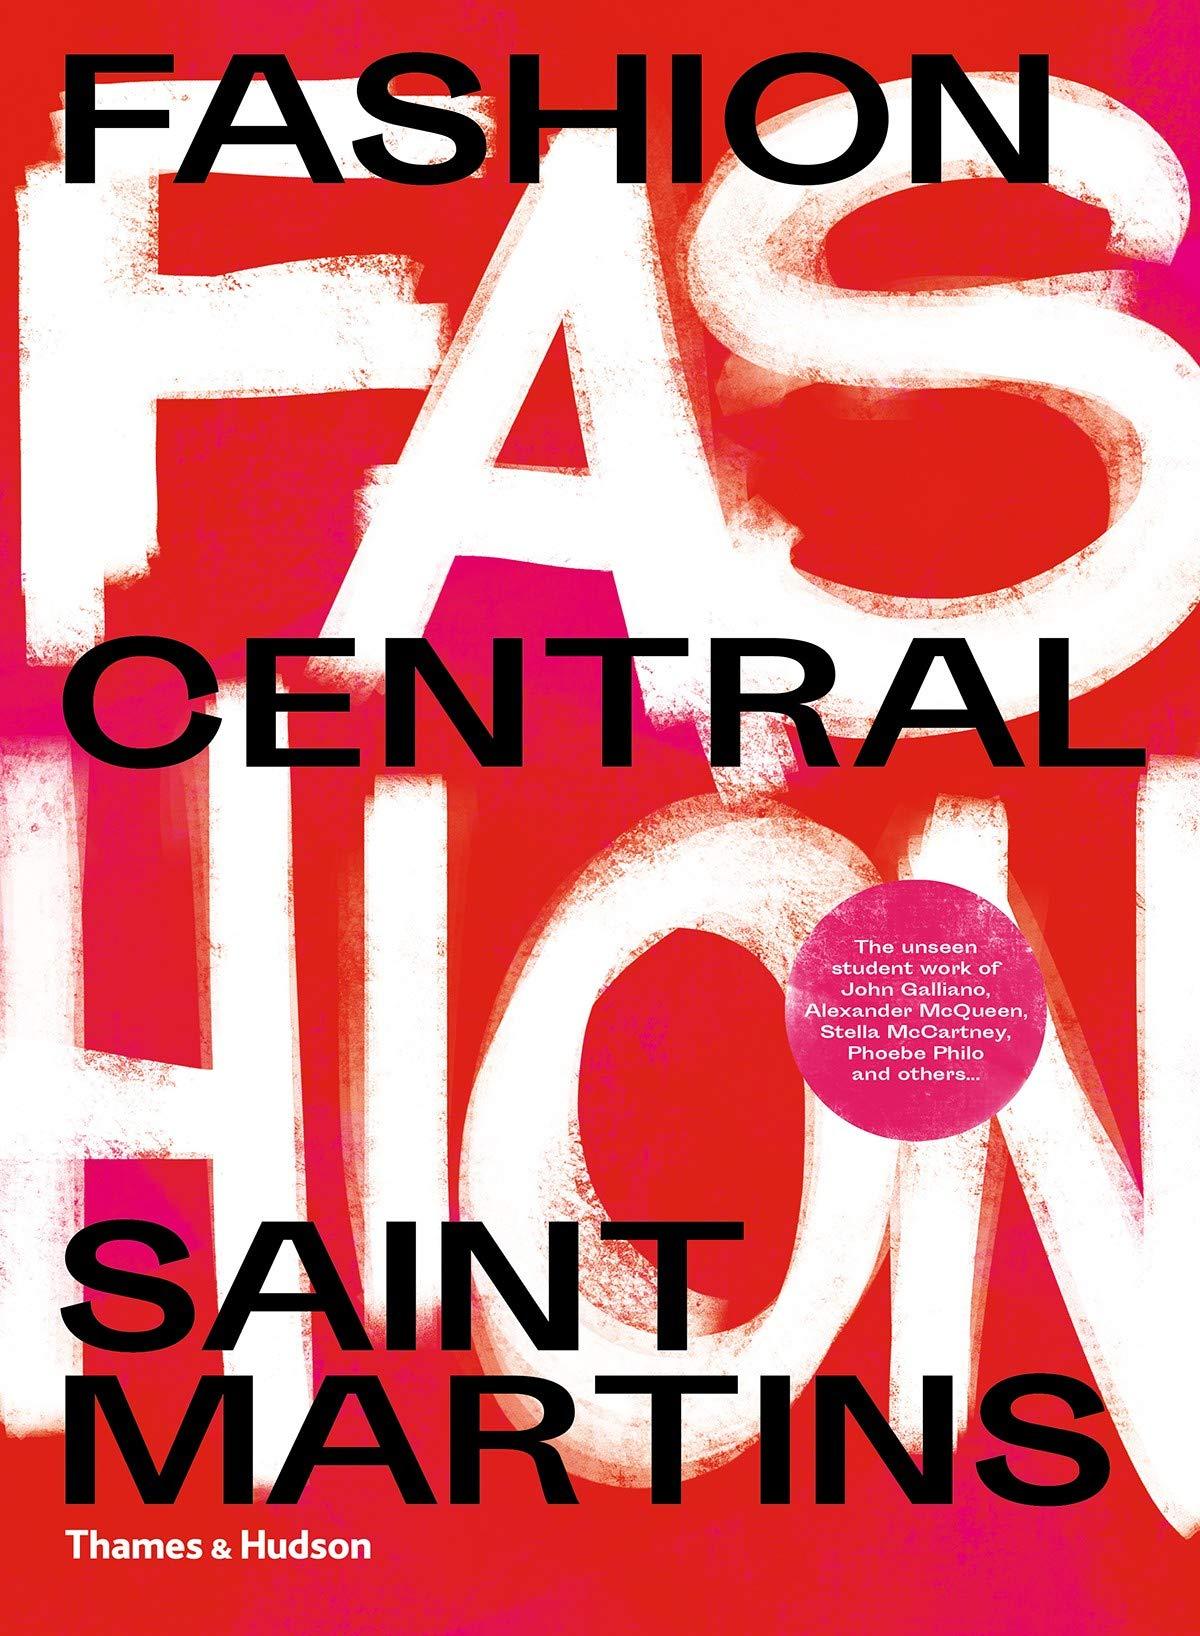 Fashion Central Saint Martins